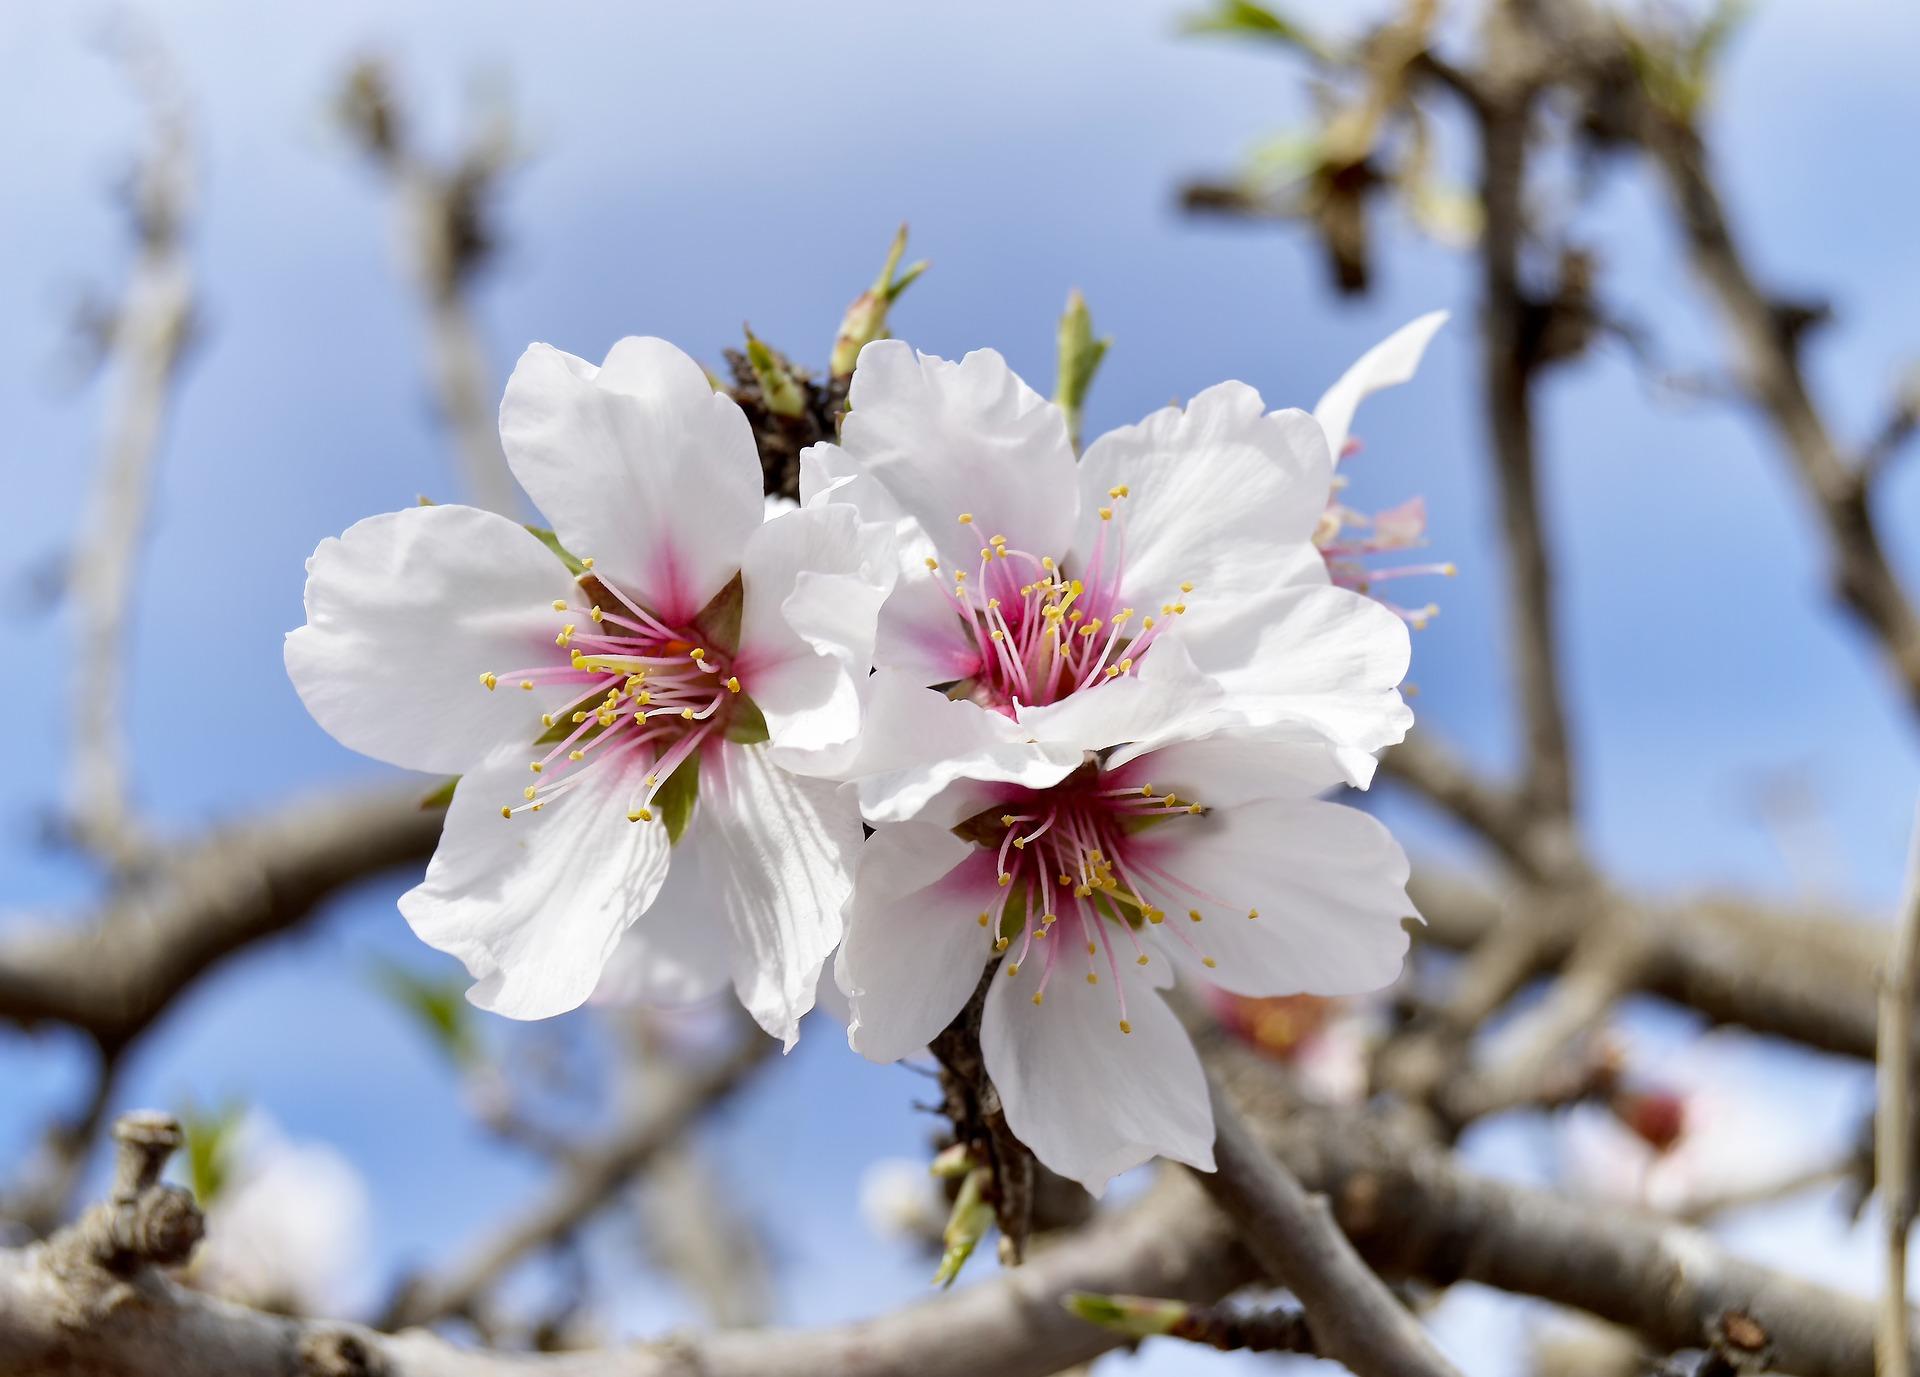 /Pulseem/ClientImages/2888///almond-flowers-3958980_1920.jpg